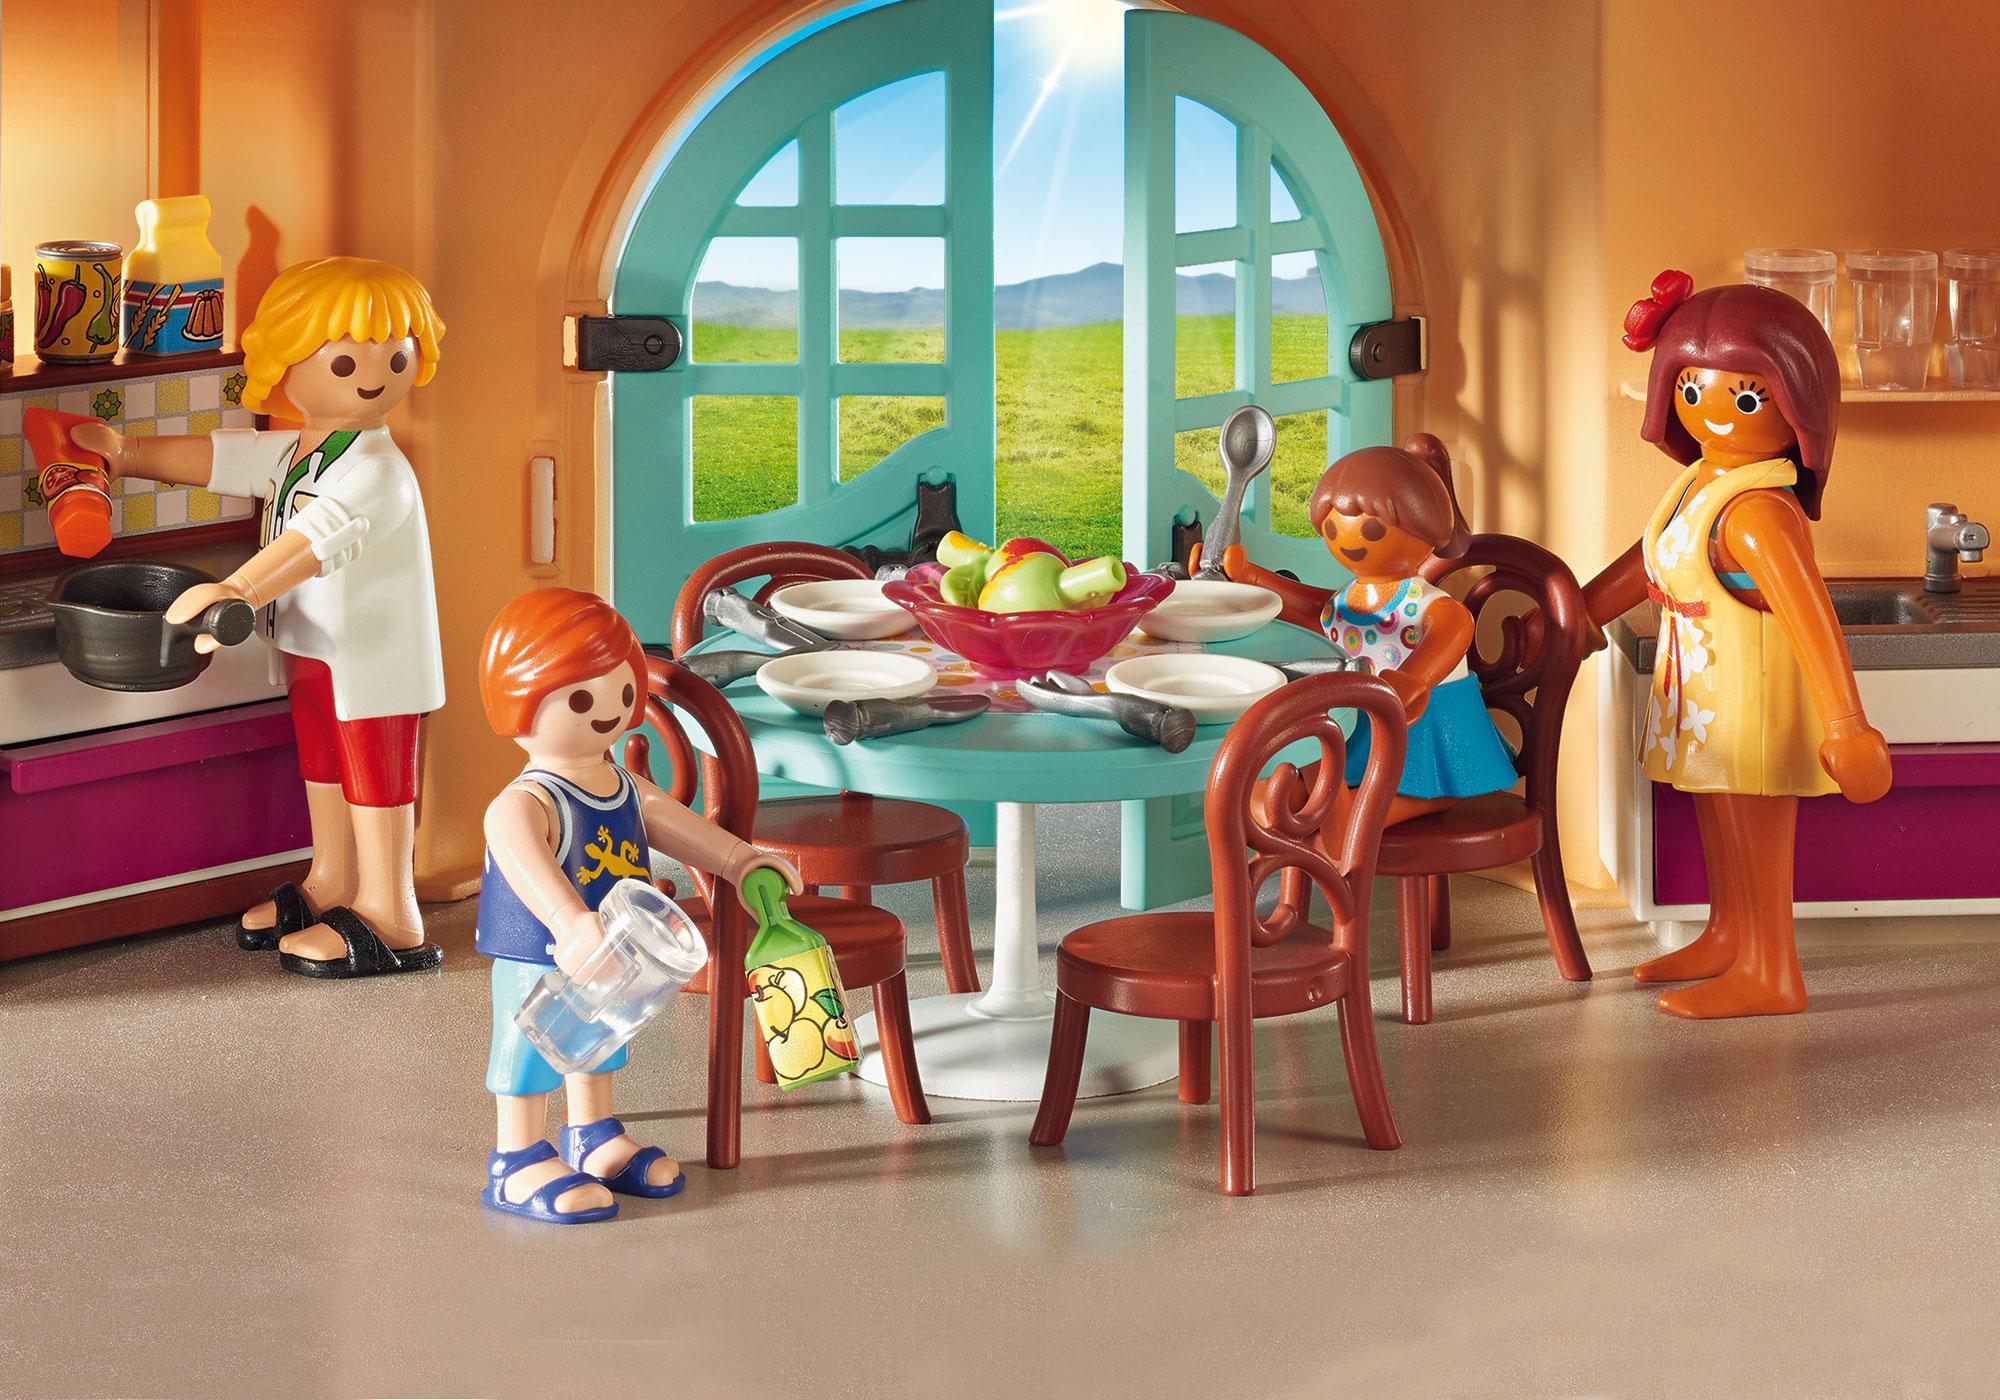 http://media.playmobil.com/i/playmobil/9420_product_extra1/Sonnige Ferienvilla